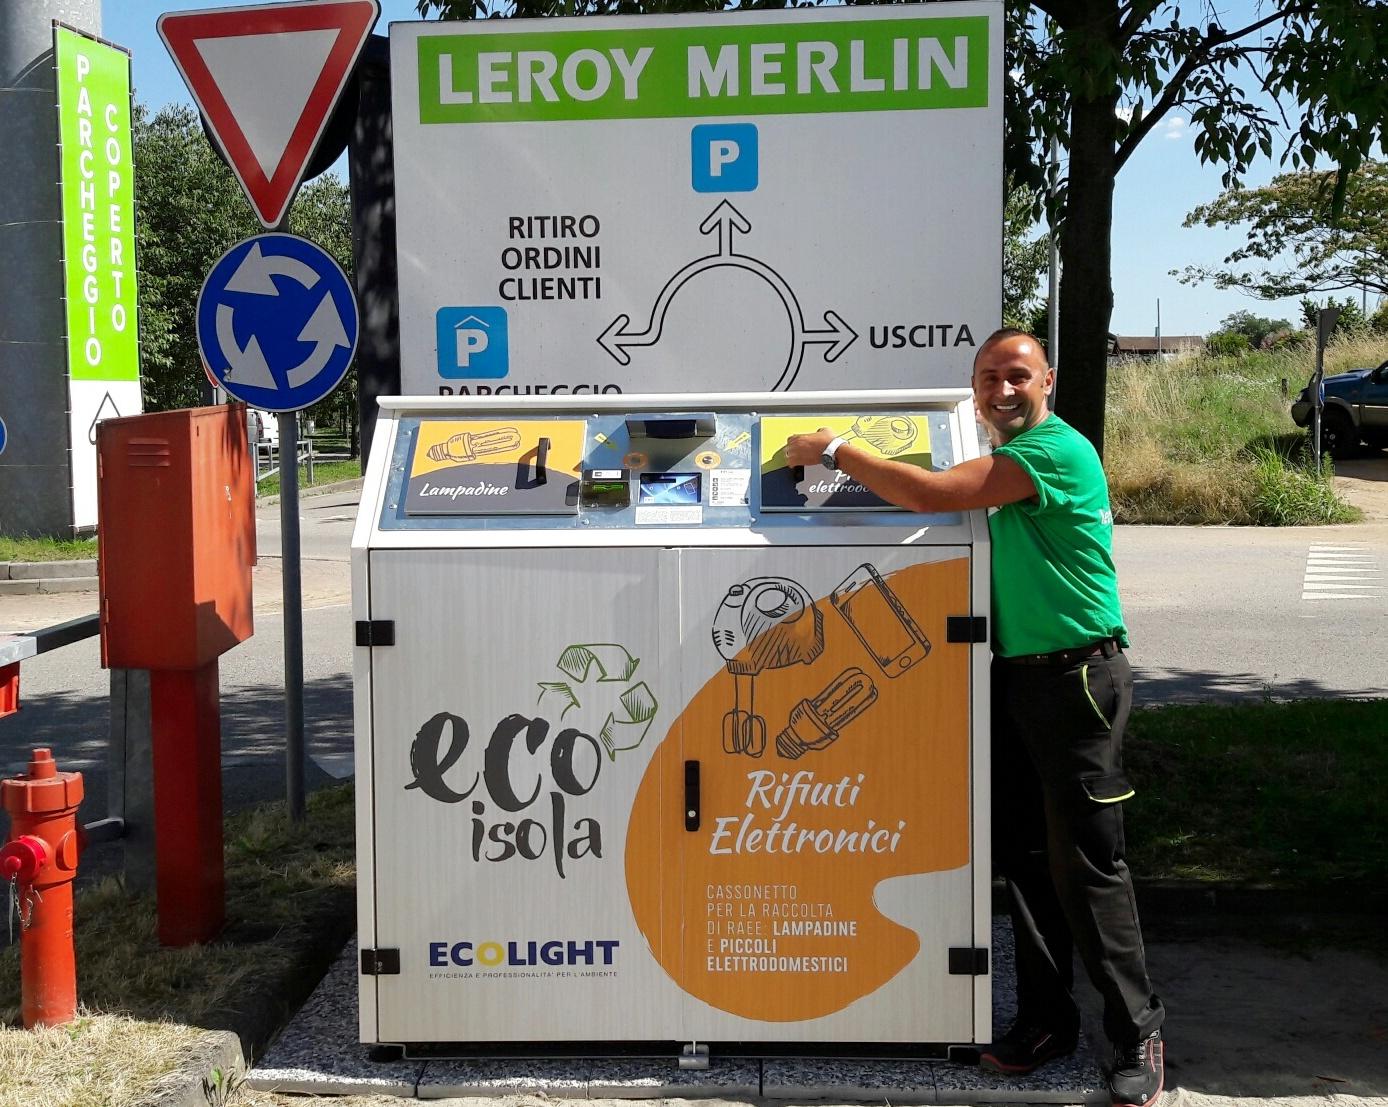 Le ecoisole anche a solbiate arno va e nova milanese mb for Leroy merlin solbiate arno